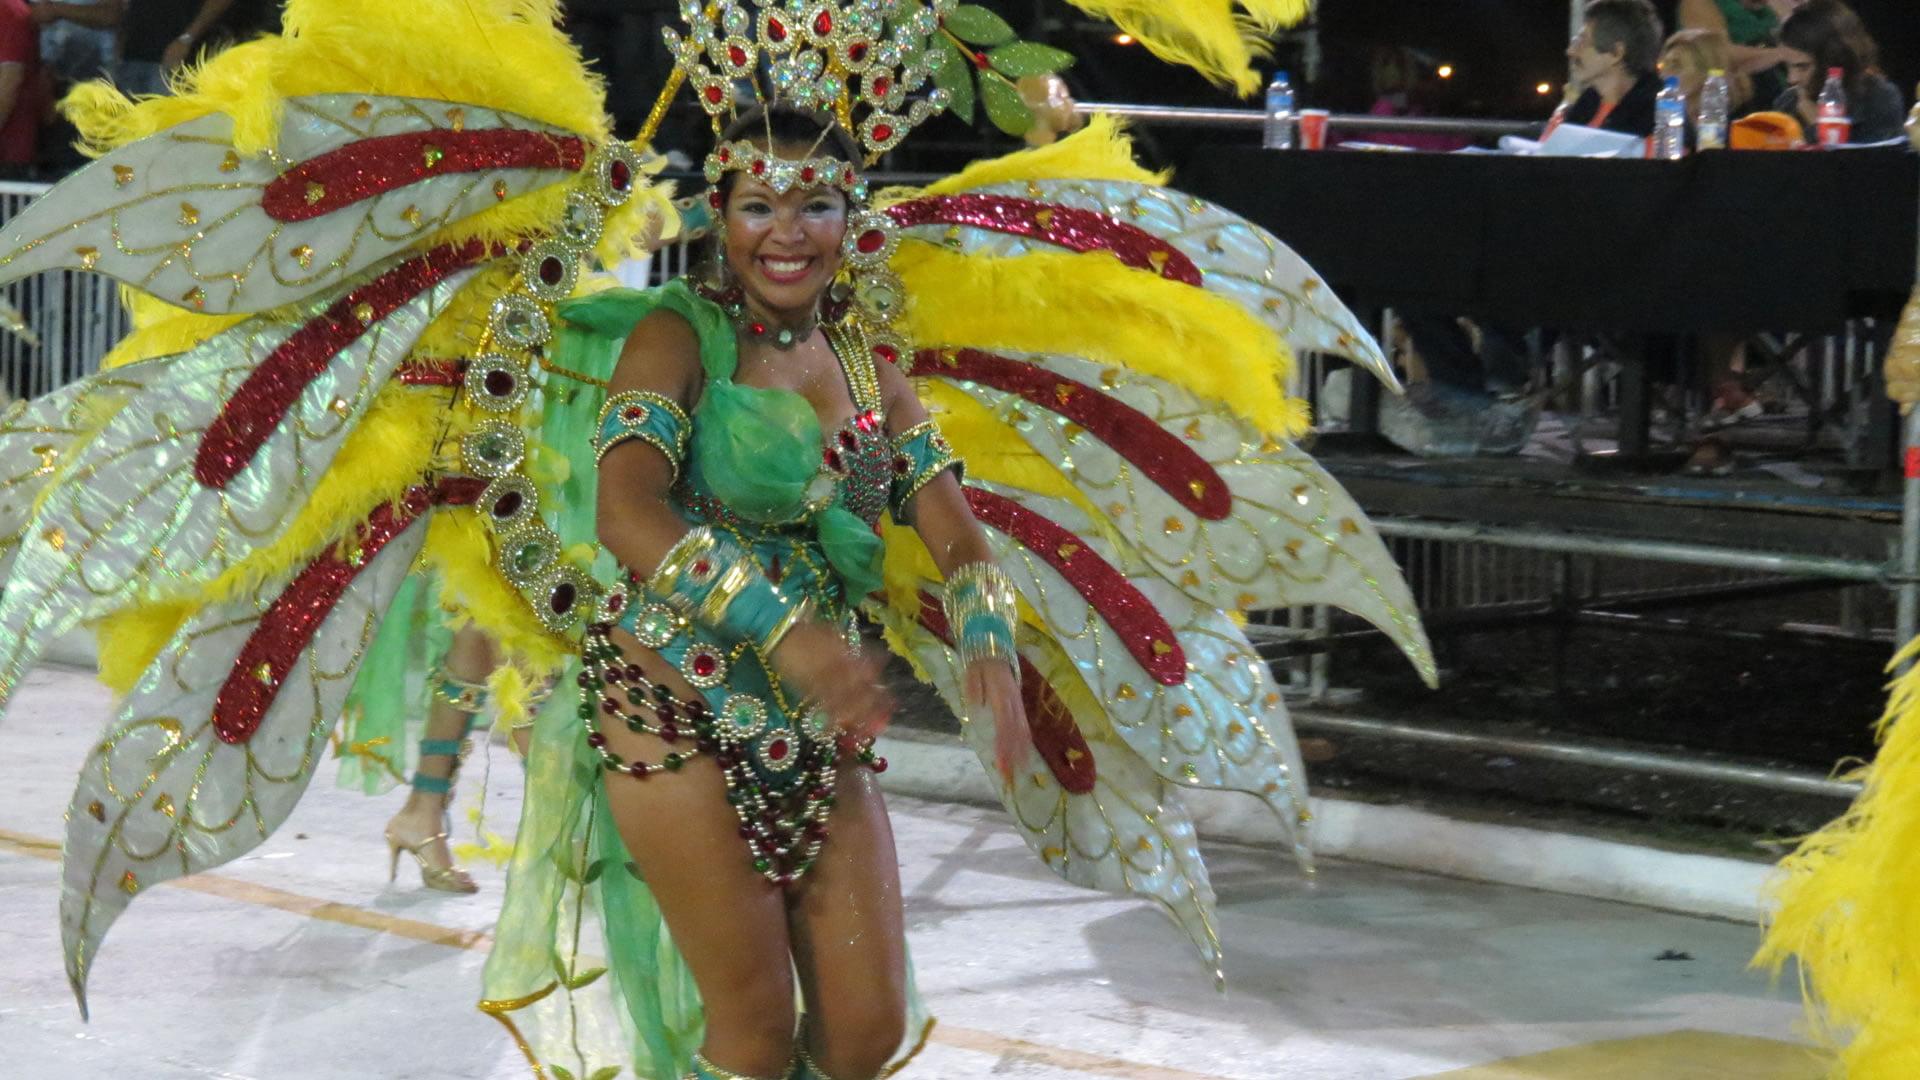 Carnaval de Corrientes (Argentina)